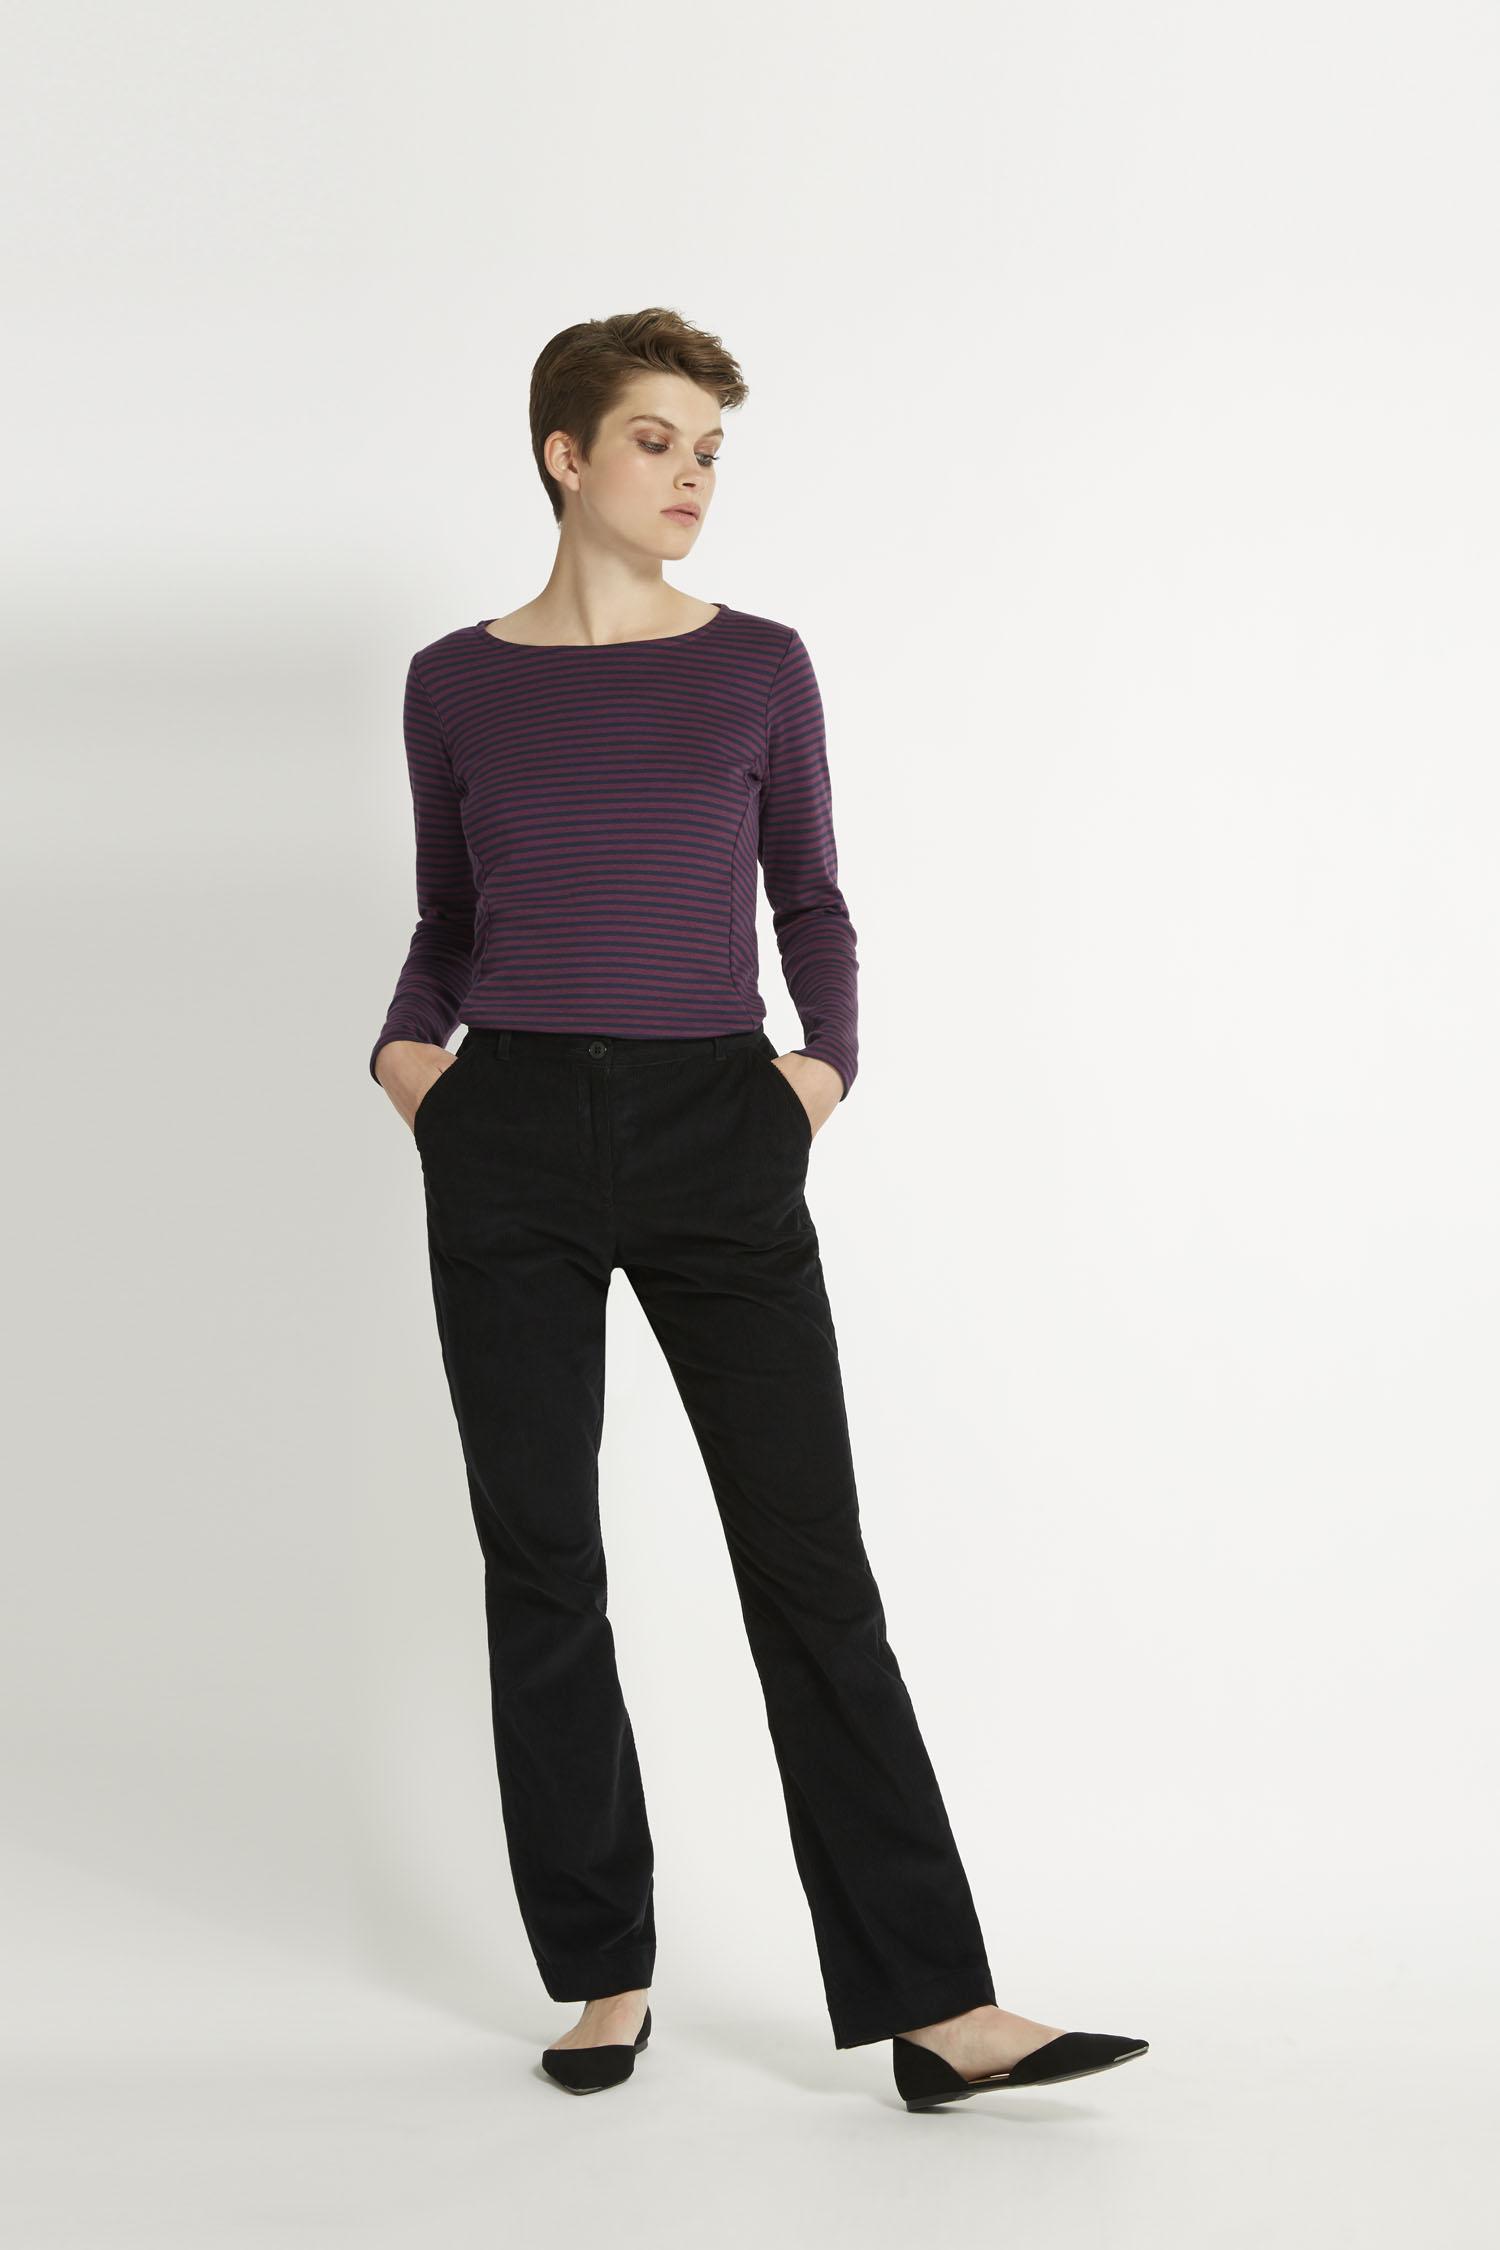 tierney-corduroy-trousers-in-black-3223c451127a.jpg